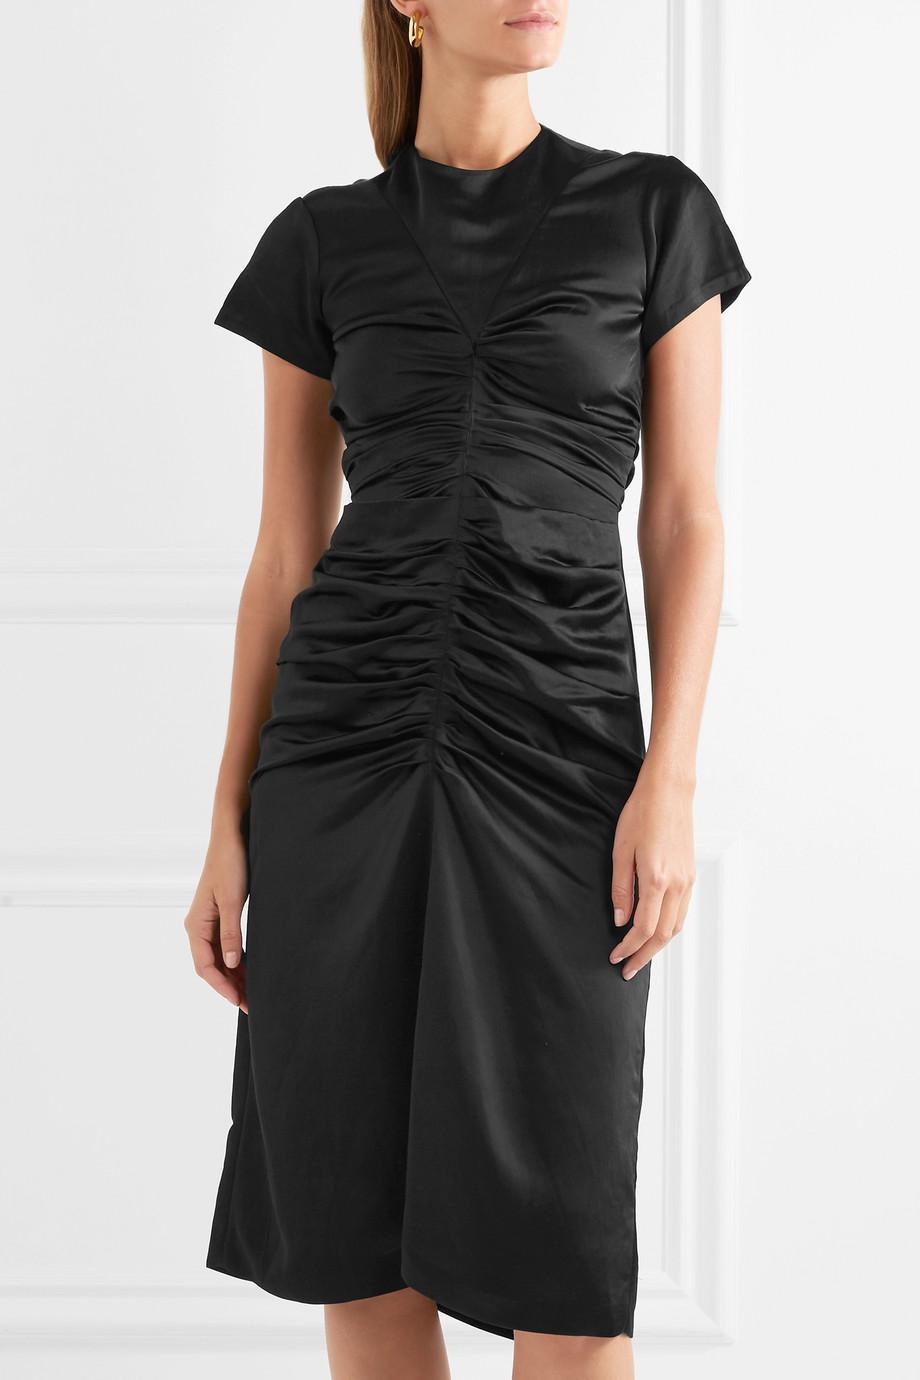 Else Ruched Satin Midi Dress - Black Isabel Marant fqB65Uwj